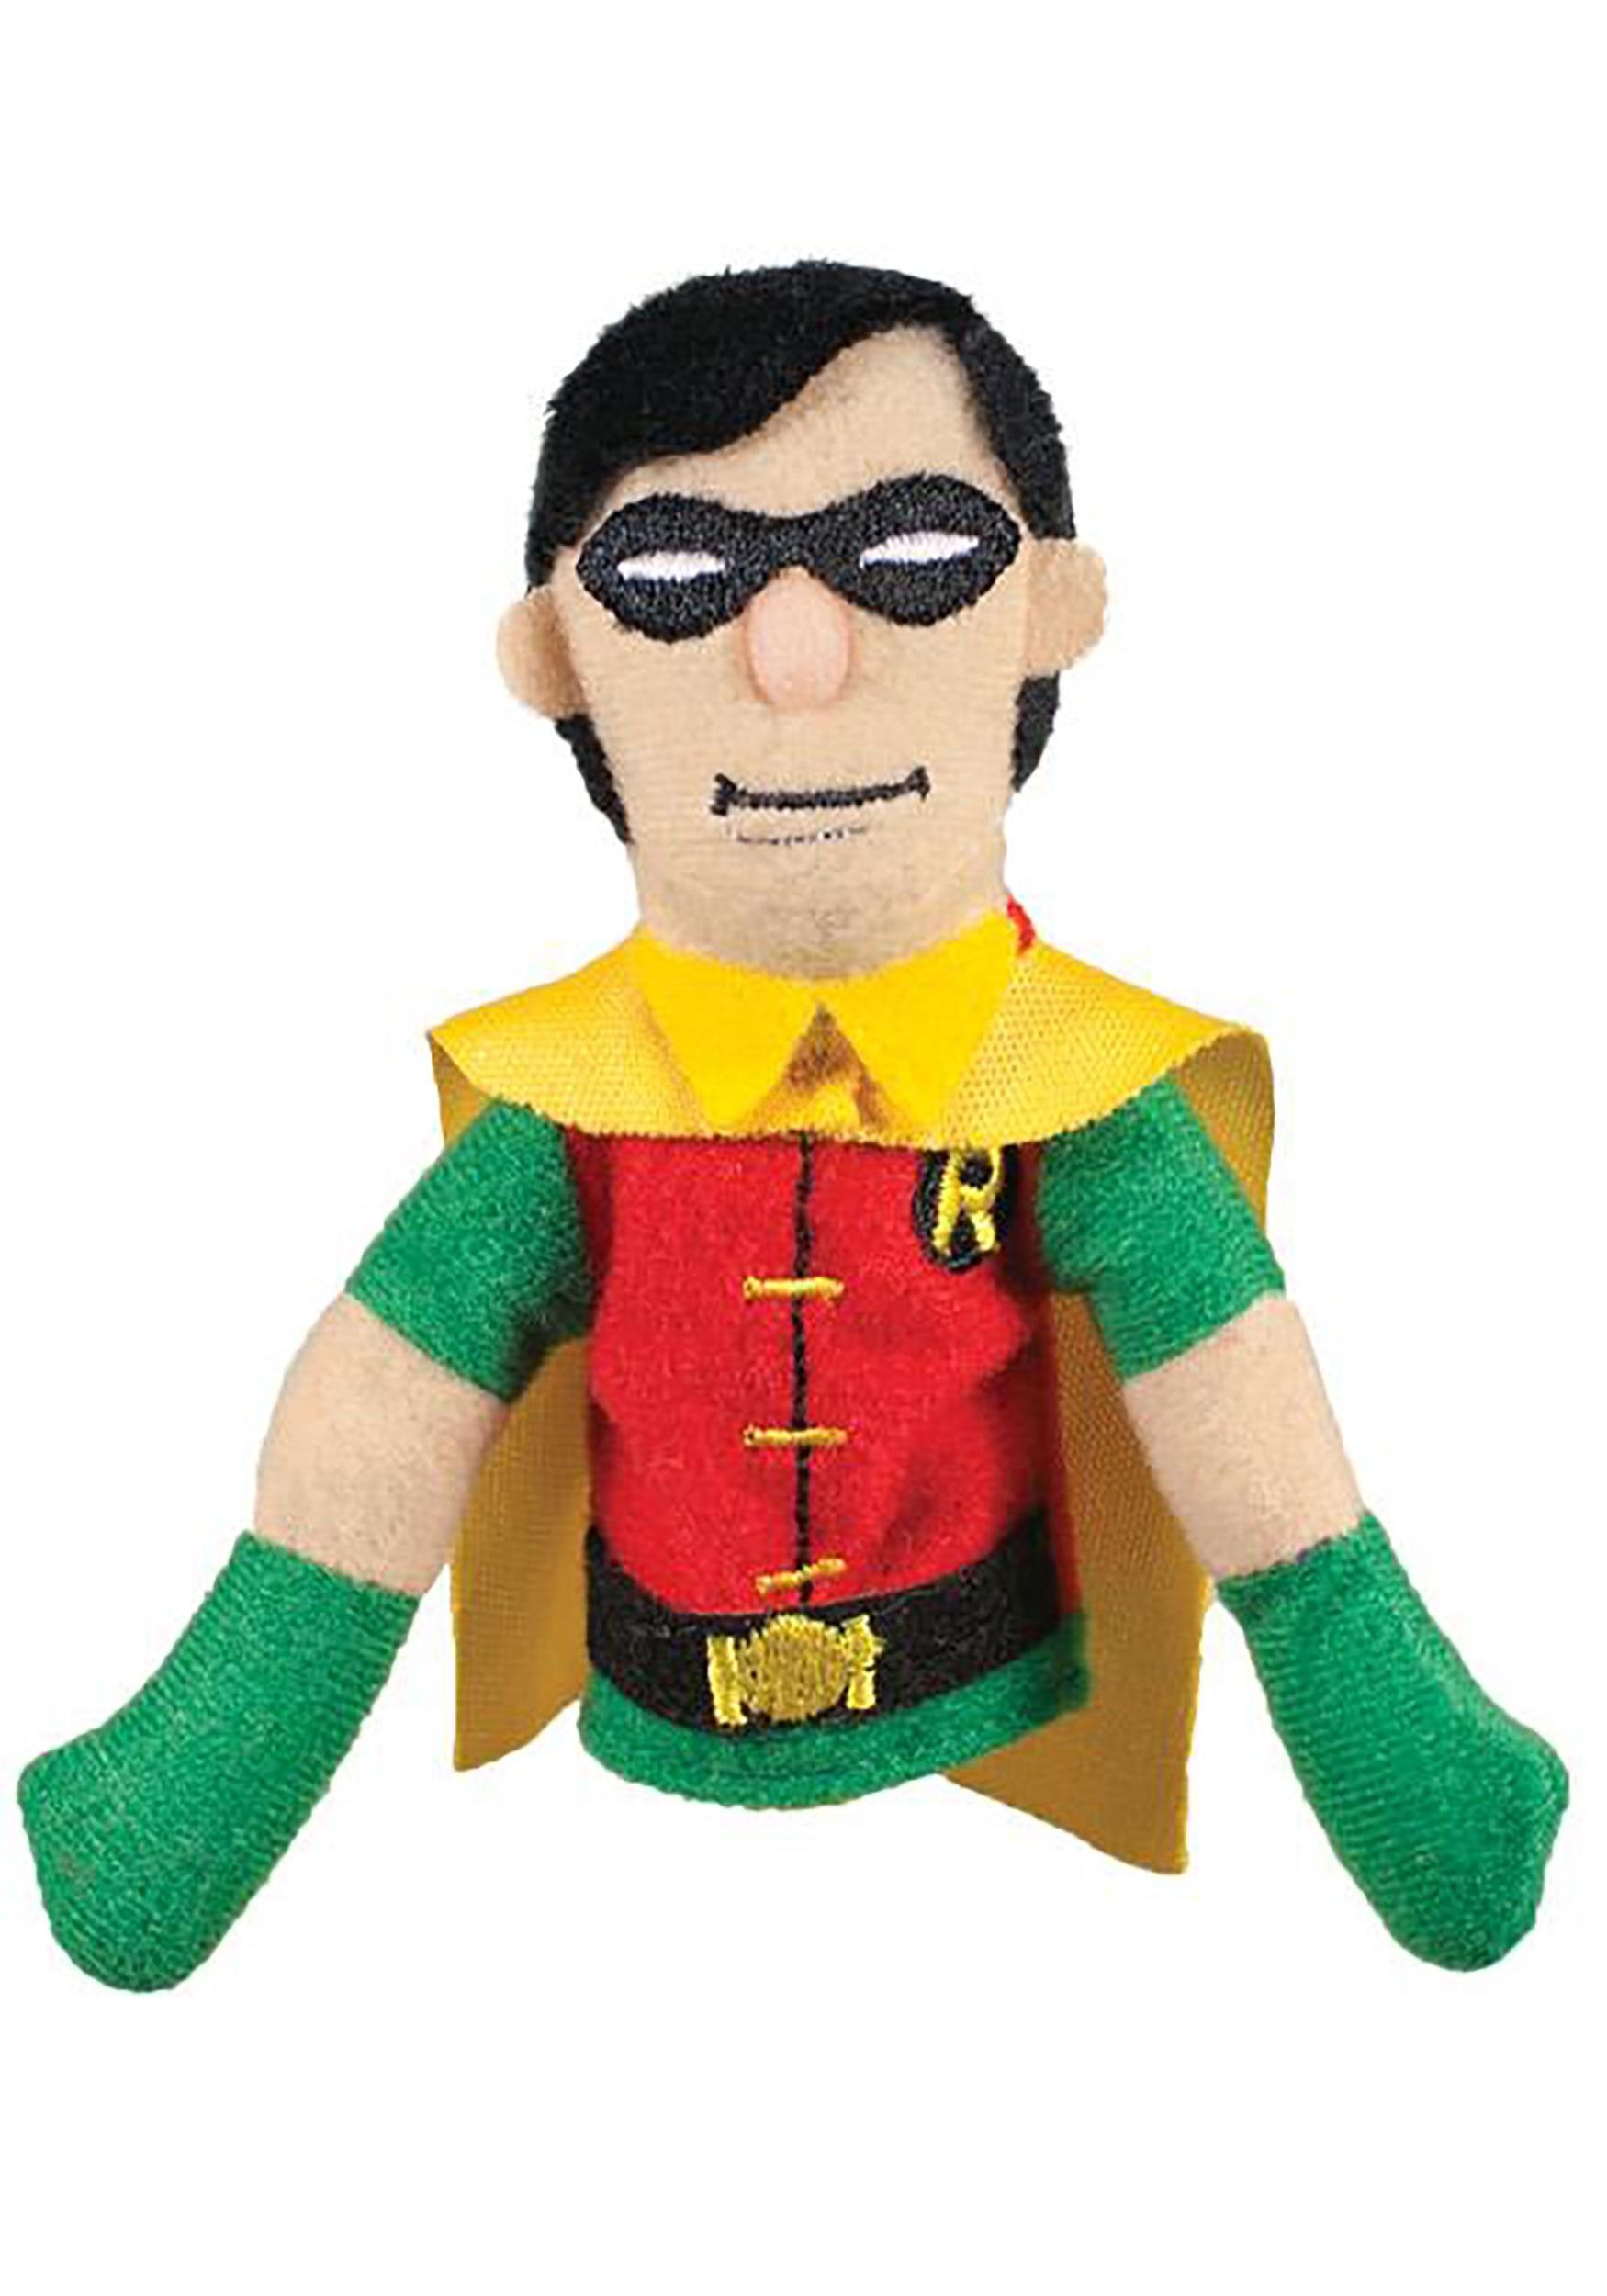 Robin Finger Puppet and Refrigerator Magnet